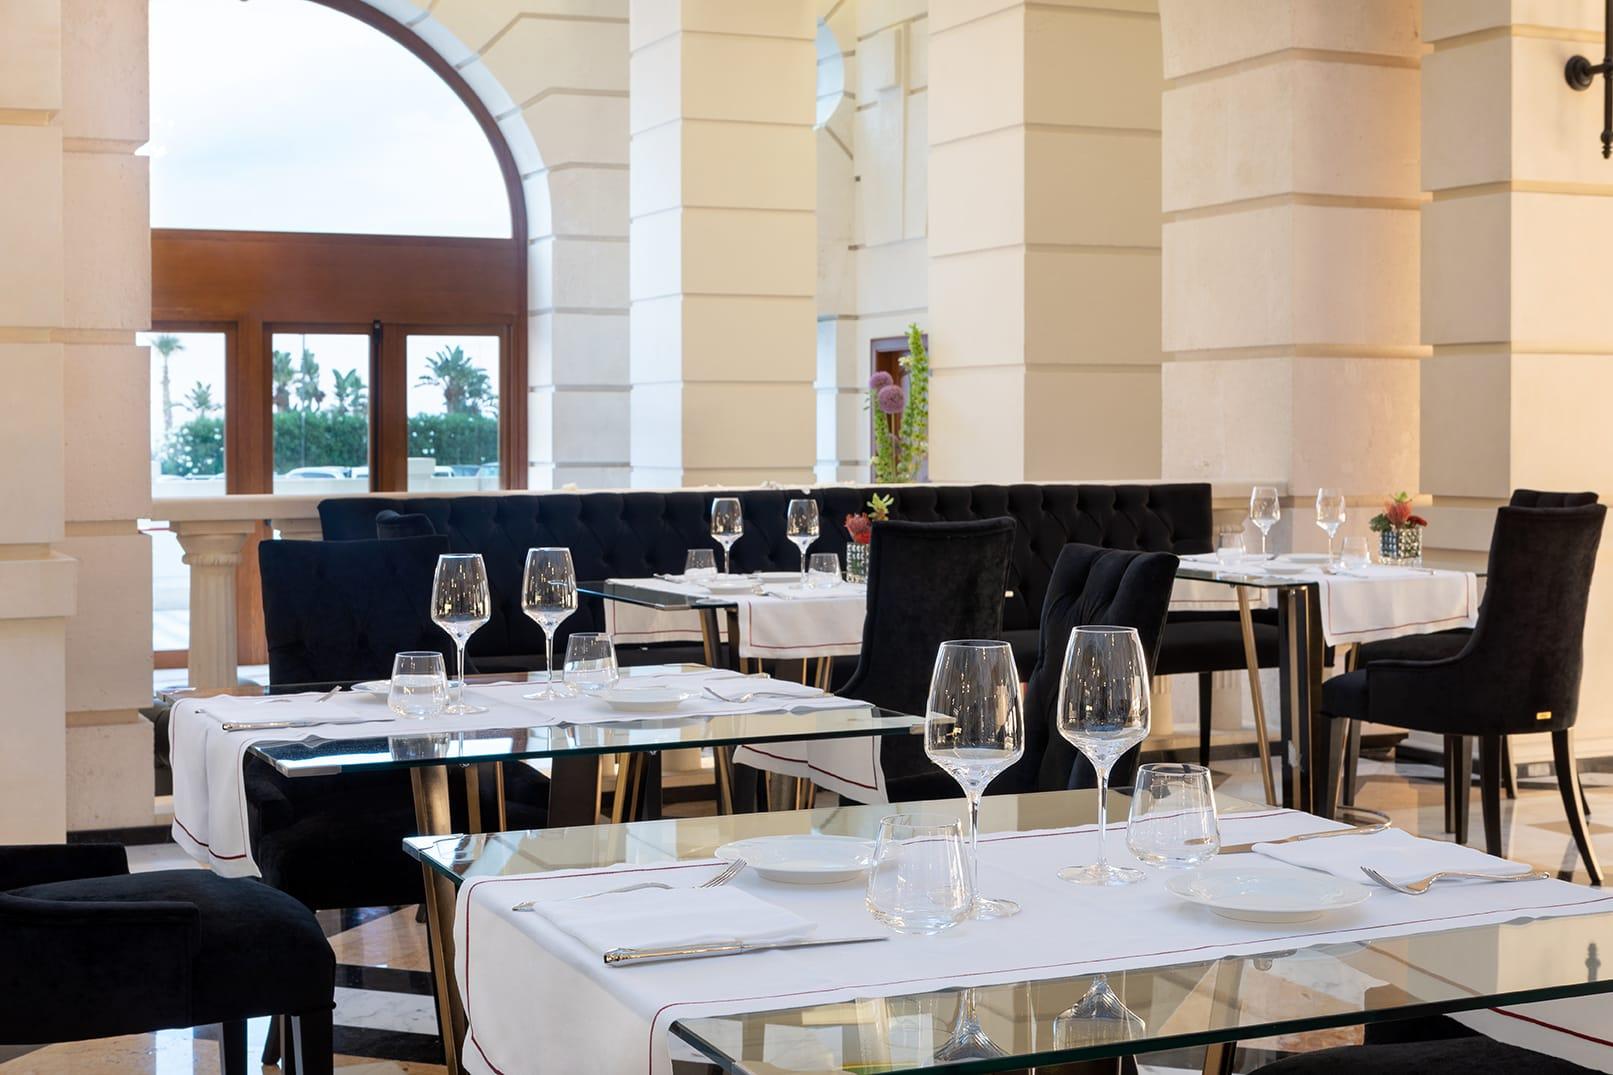 Cortile Restaurant 002_WebRes